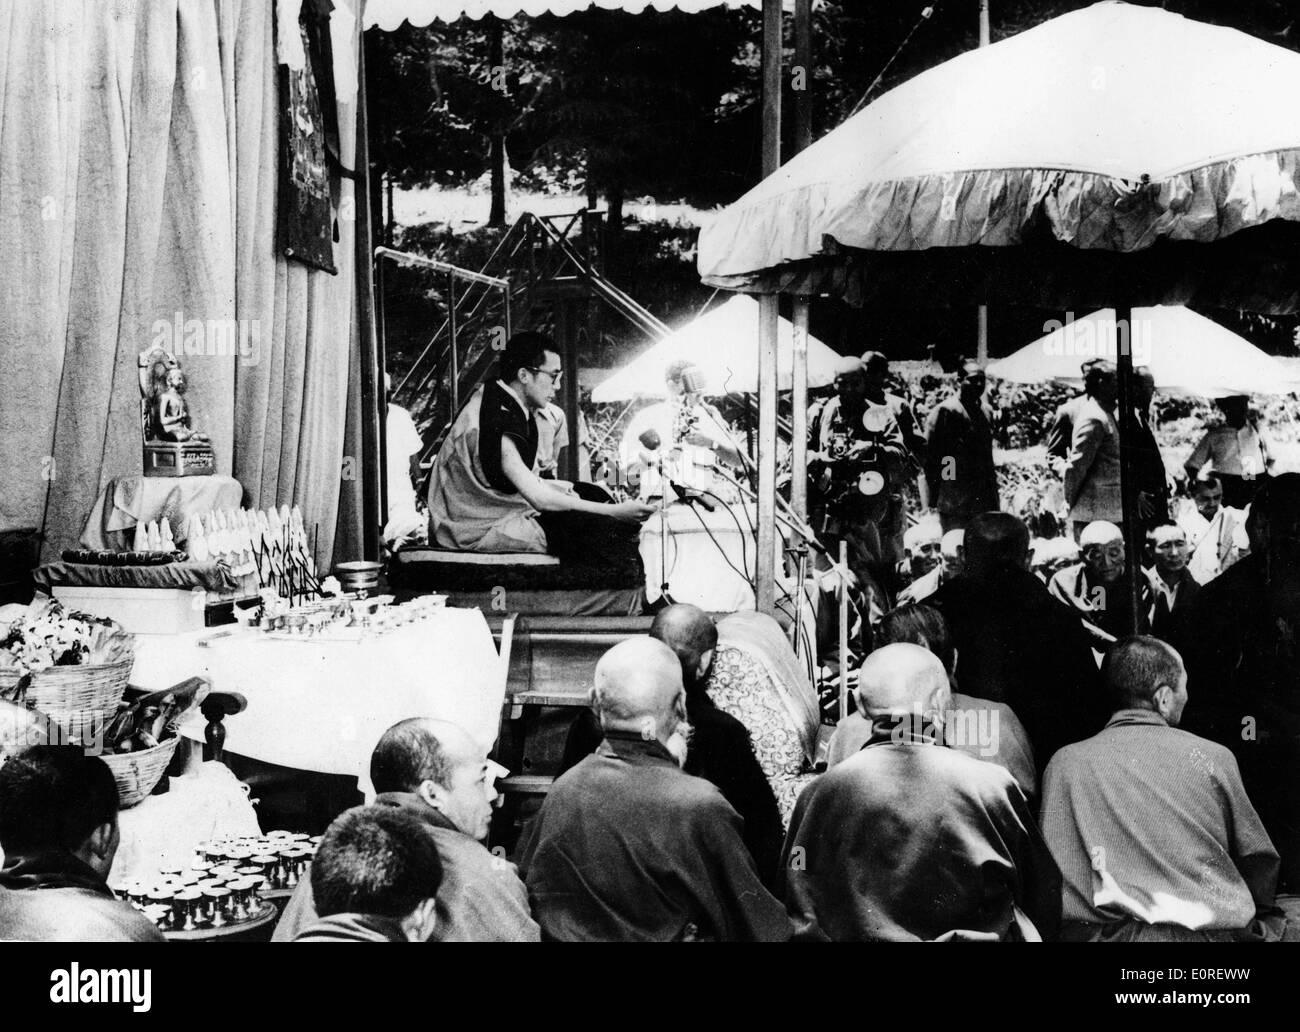 The 14th Dalai Lama at a celebration for Buddha's birthday - Stock Image